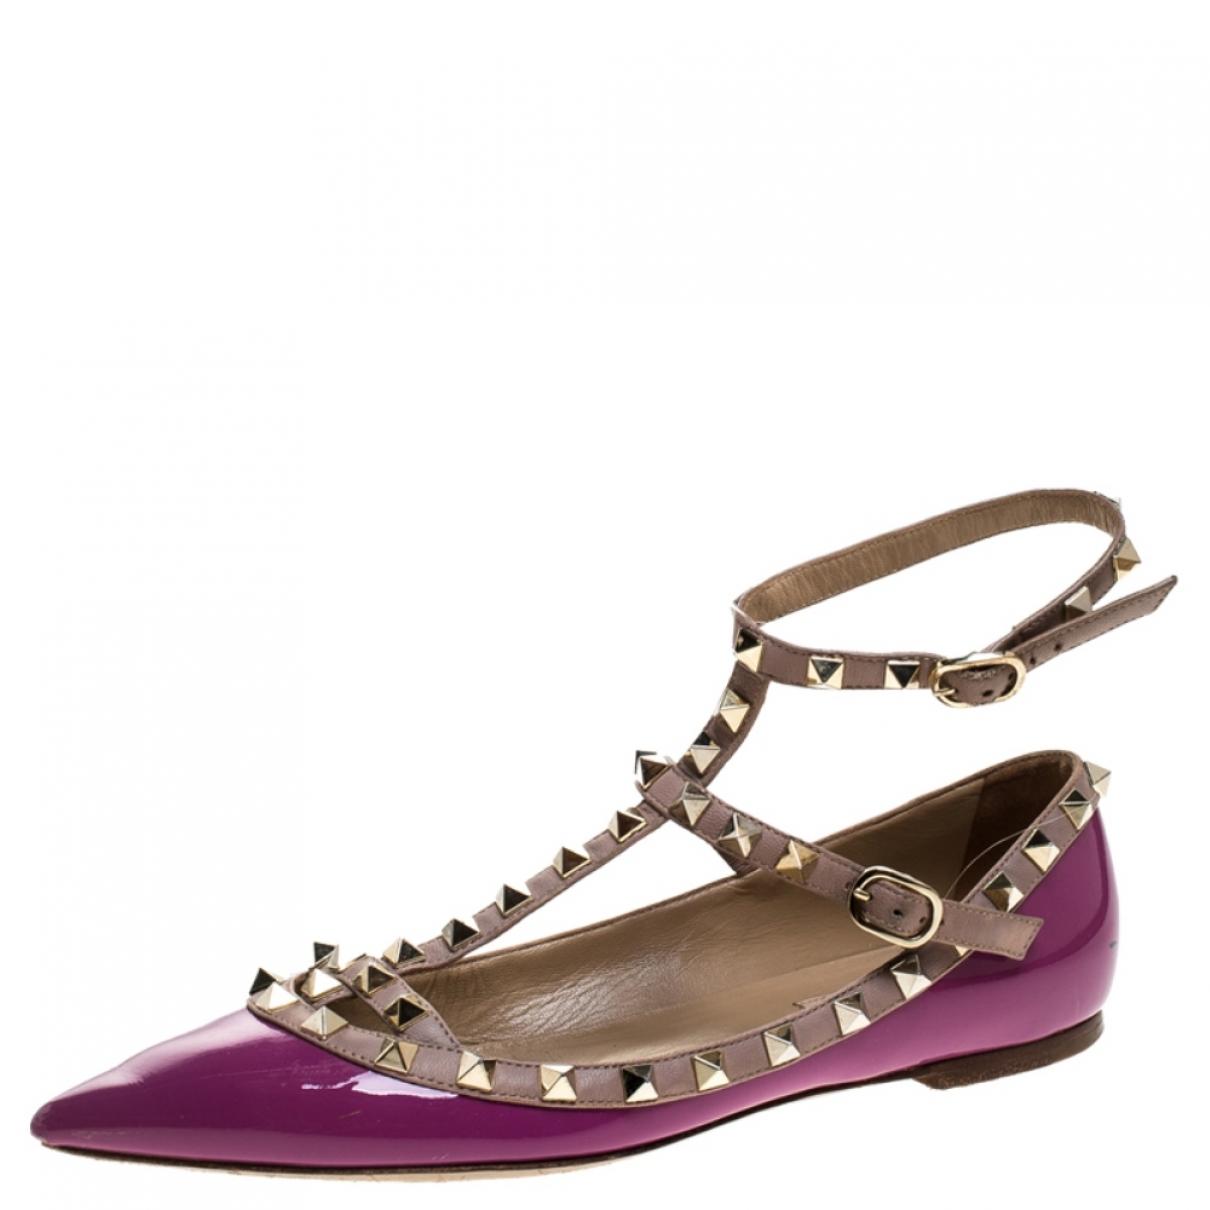 Valentino Garavani - Ballerines Rockstud pour femme en cuir - violet